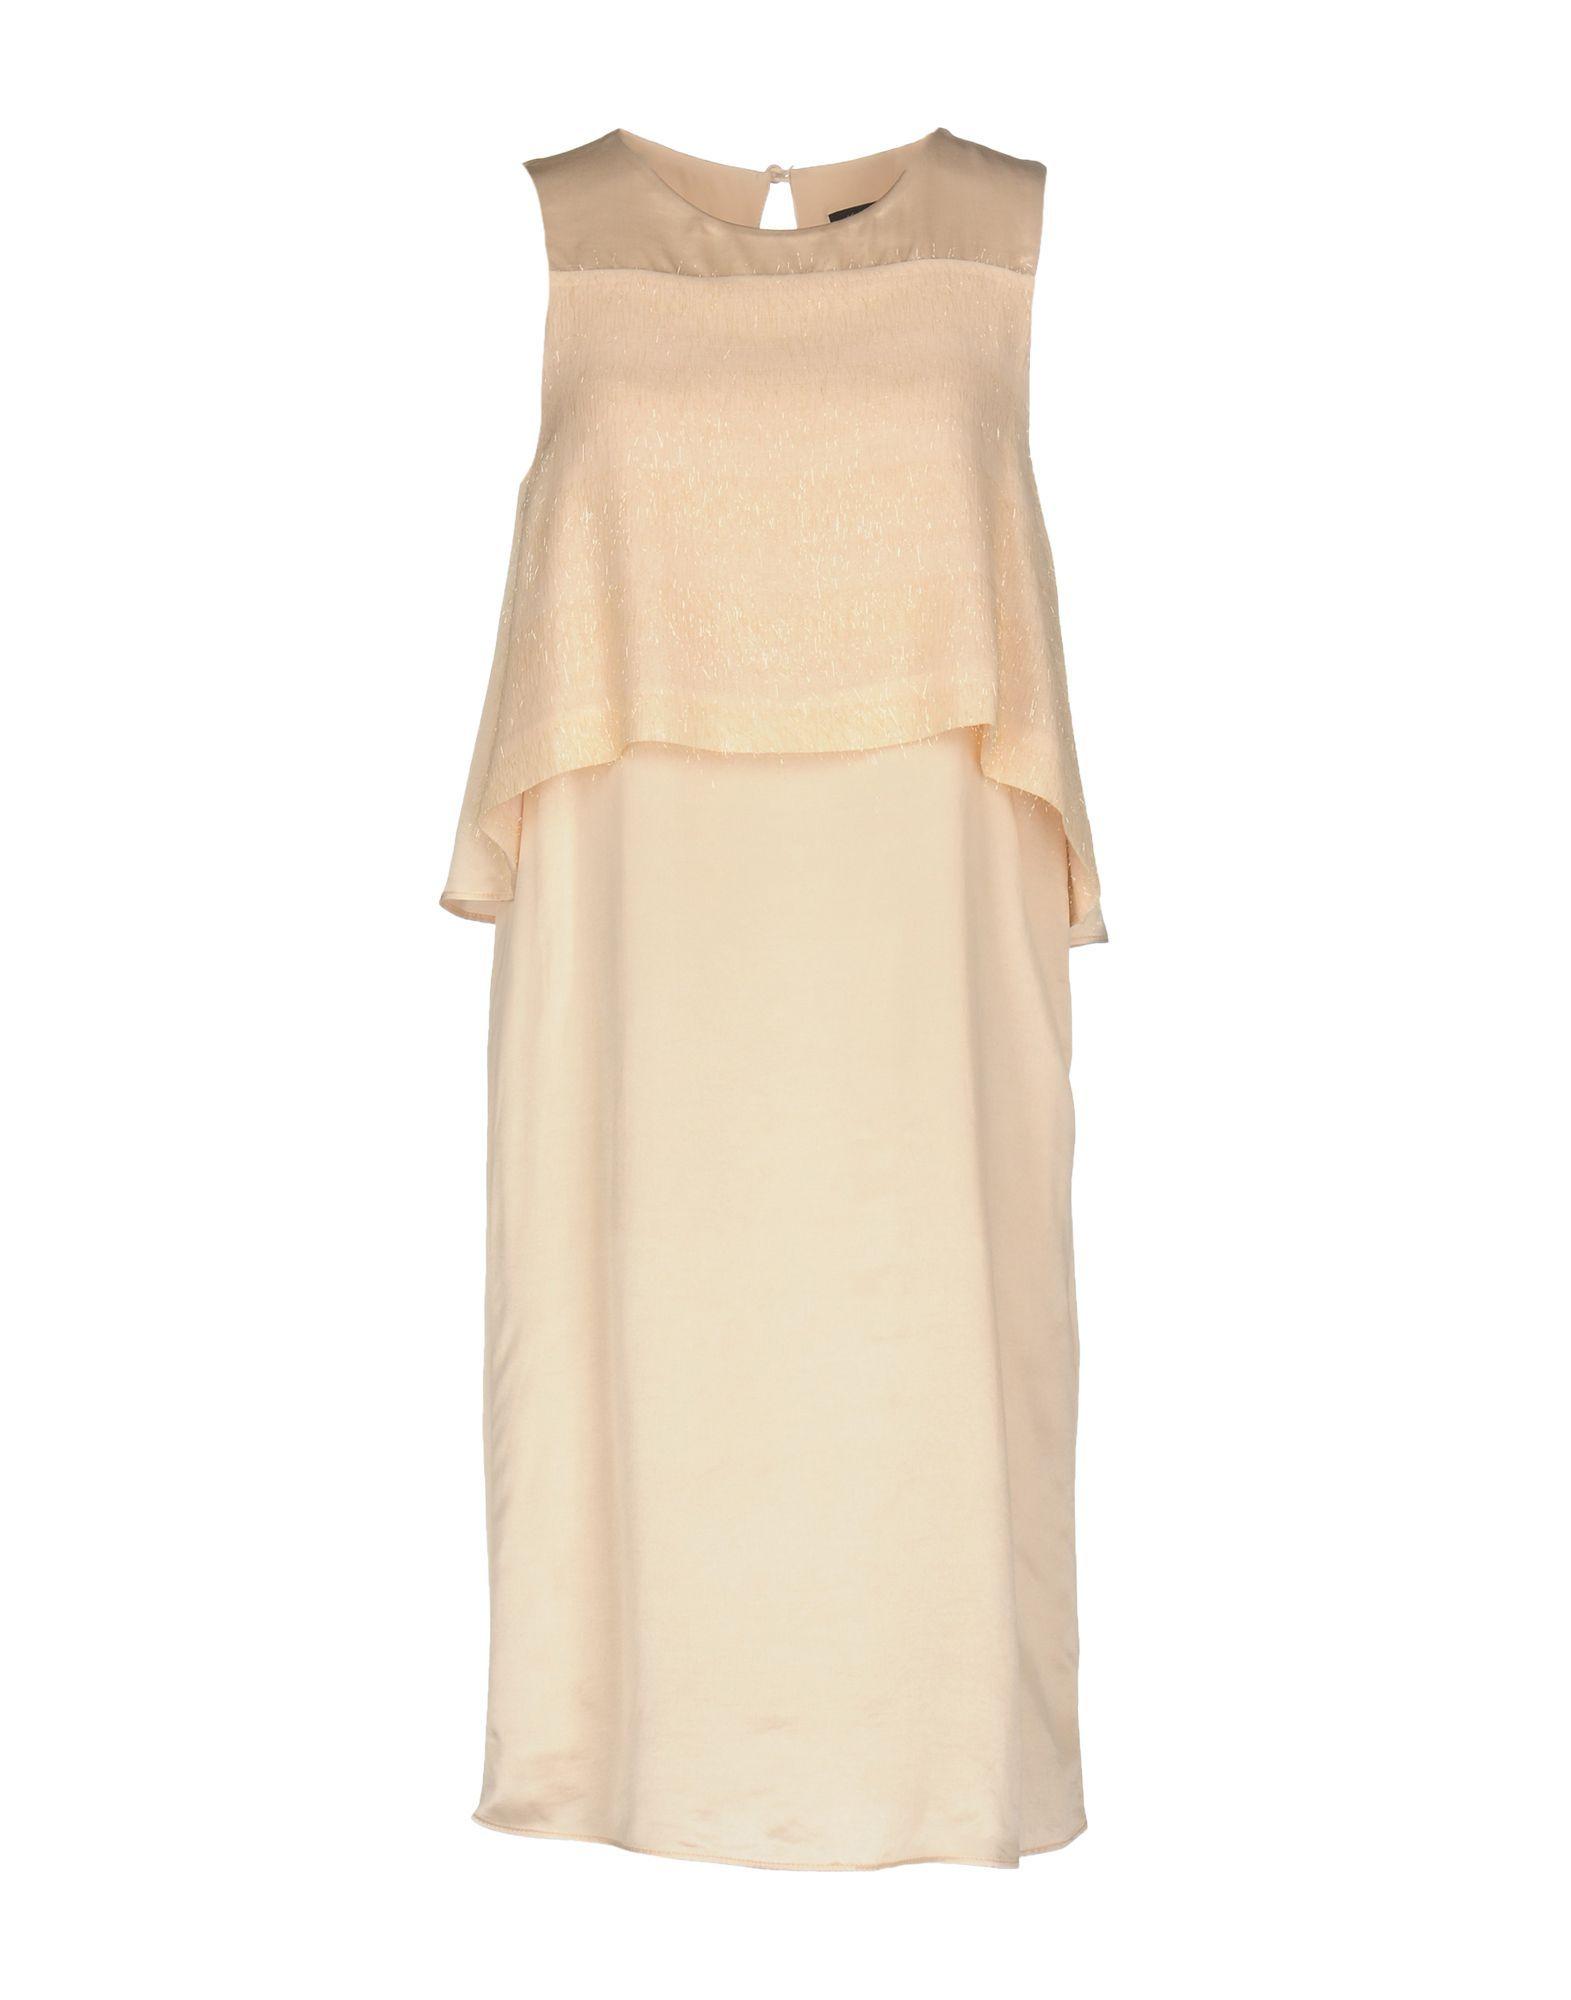 Dress Katia Giannini Black Women's Cotton